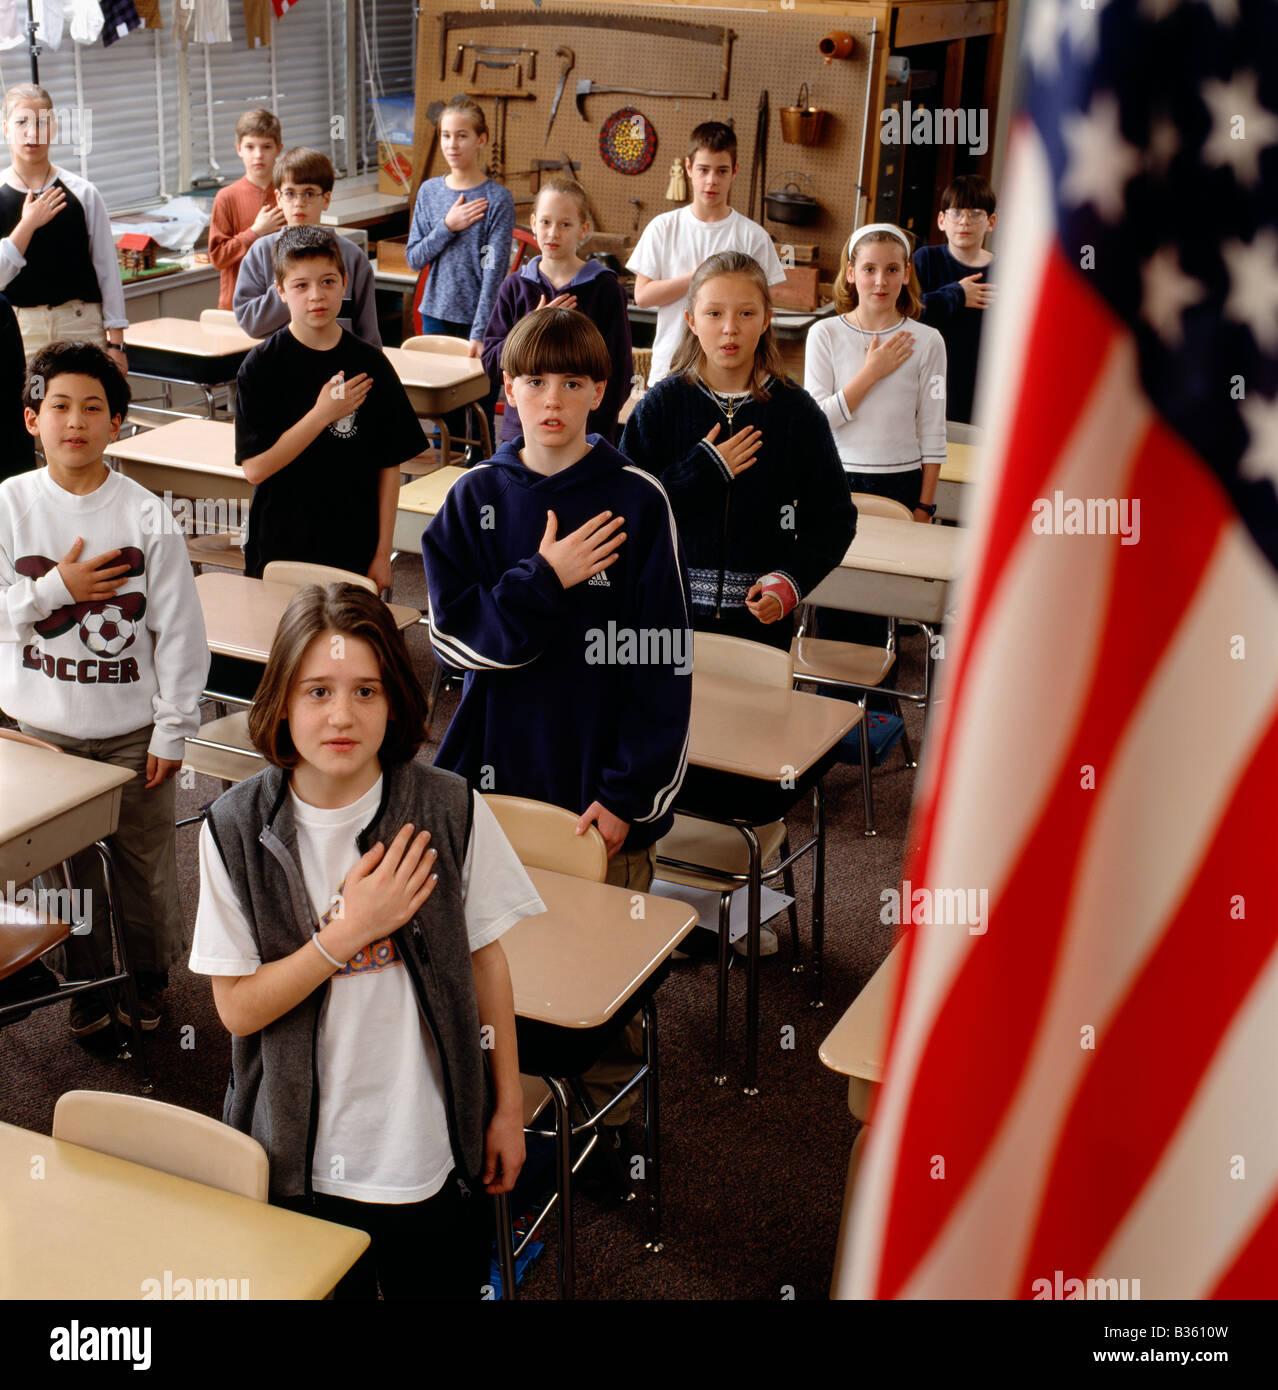 Elementary School Children Recite The Pledge Of Allegiance